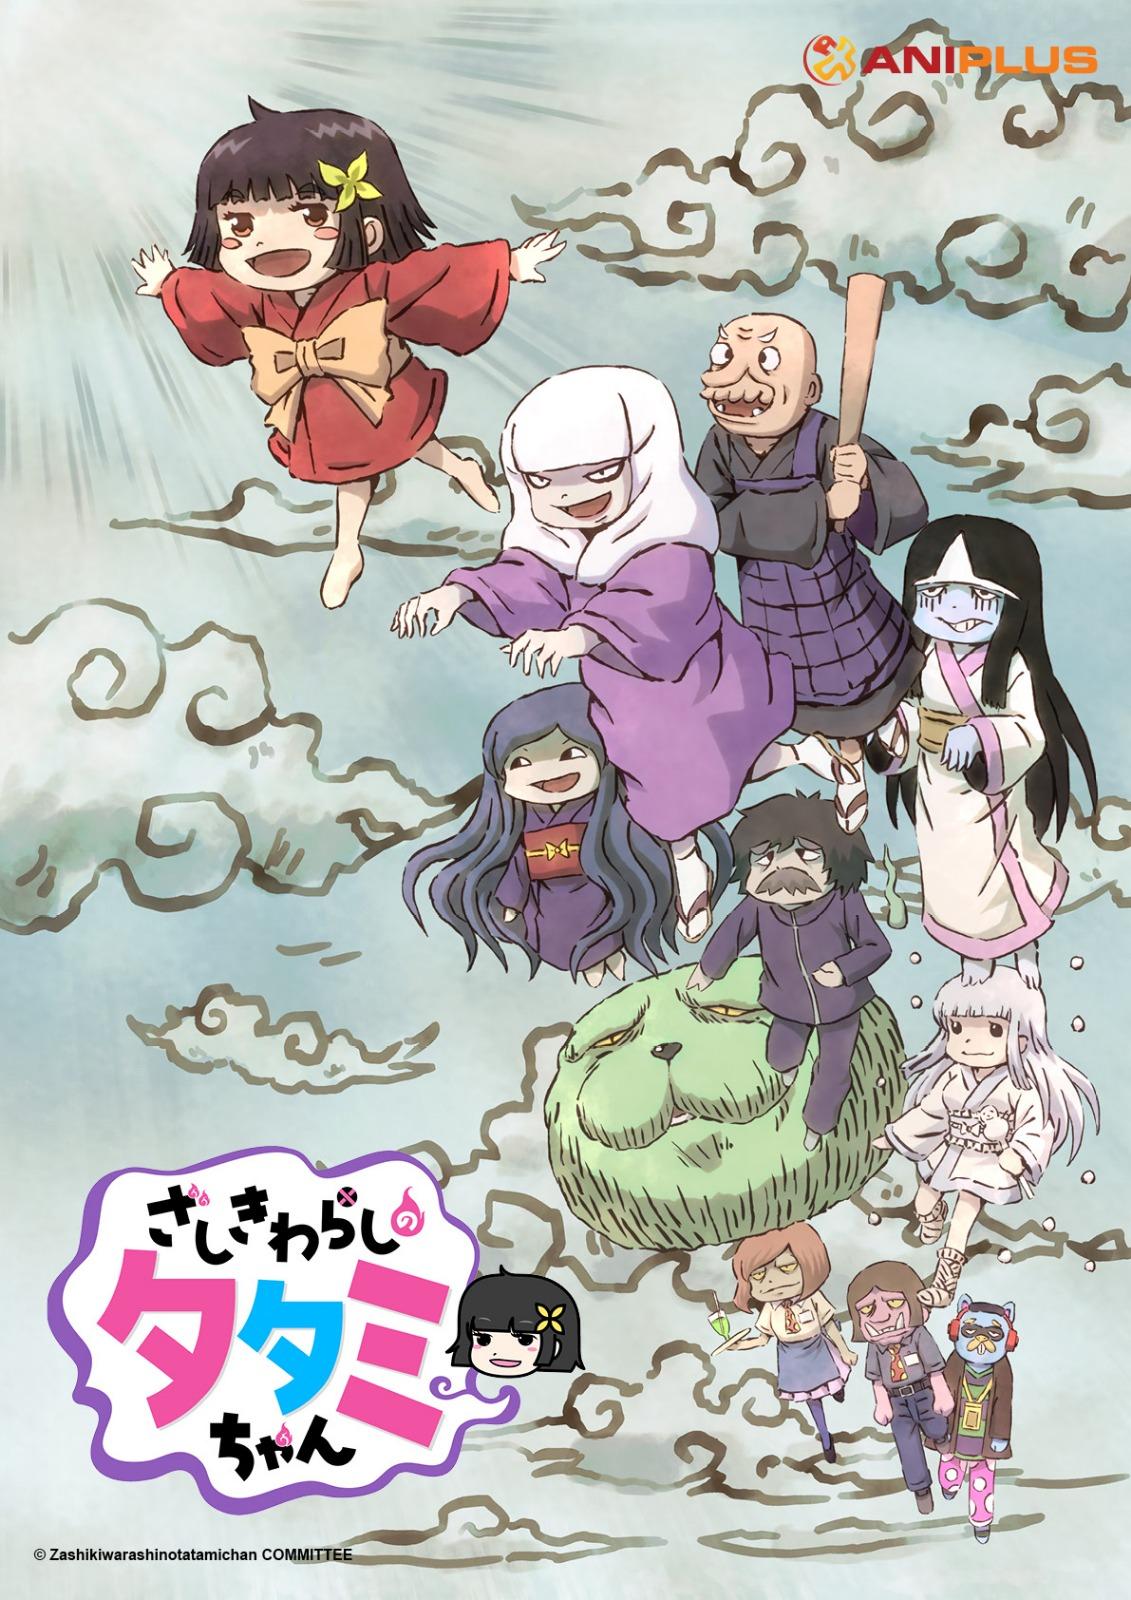 ANIPLUS Asia Spring 2020 anime - Tatami-chan